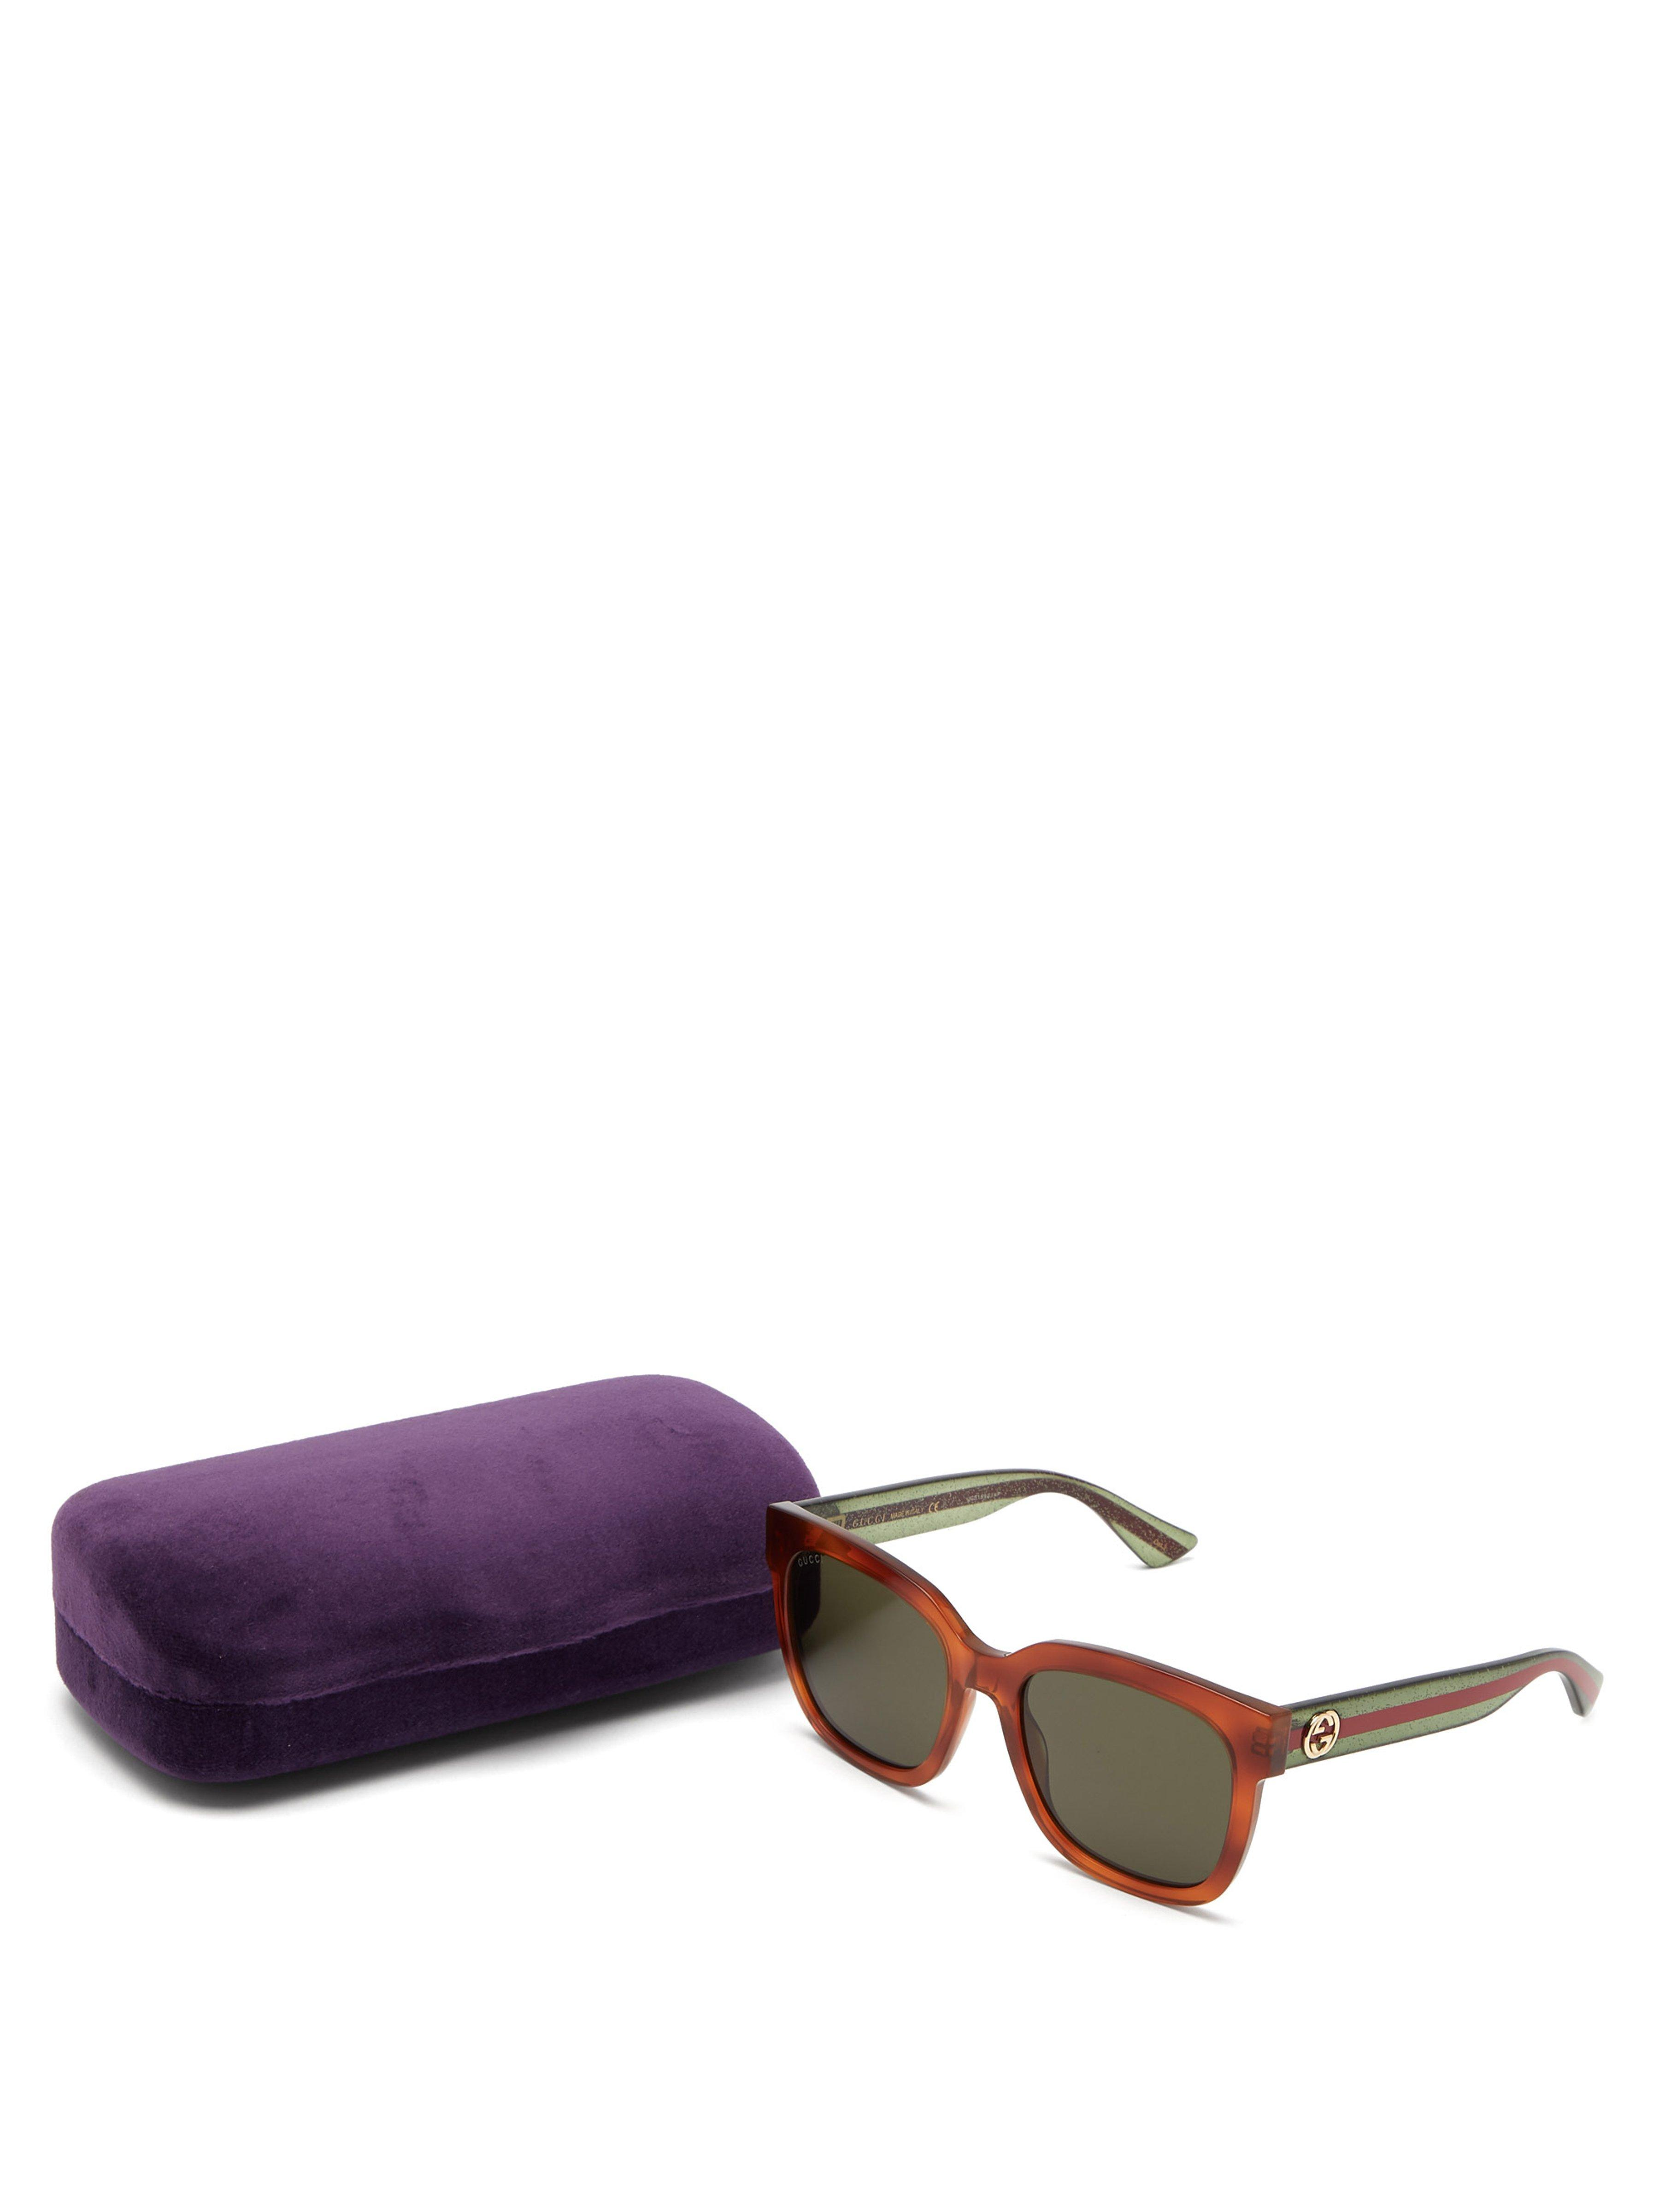 12d2f88063 Gucci - Green Web Striped Square Frame Acetate Sunglasses - Lyst. View  fullscreen